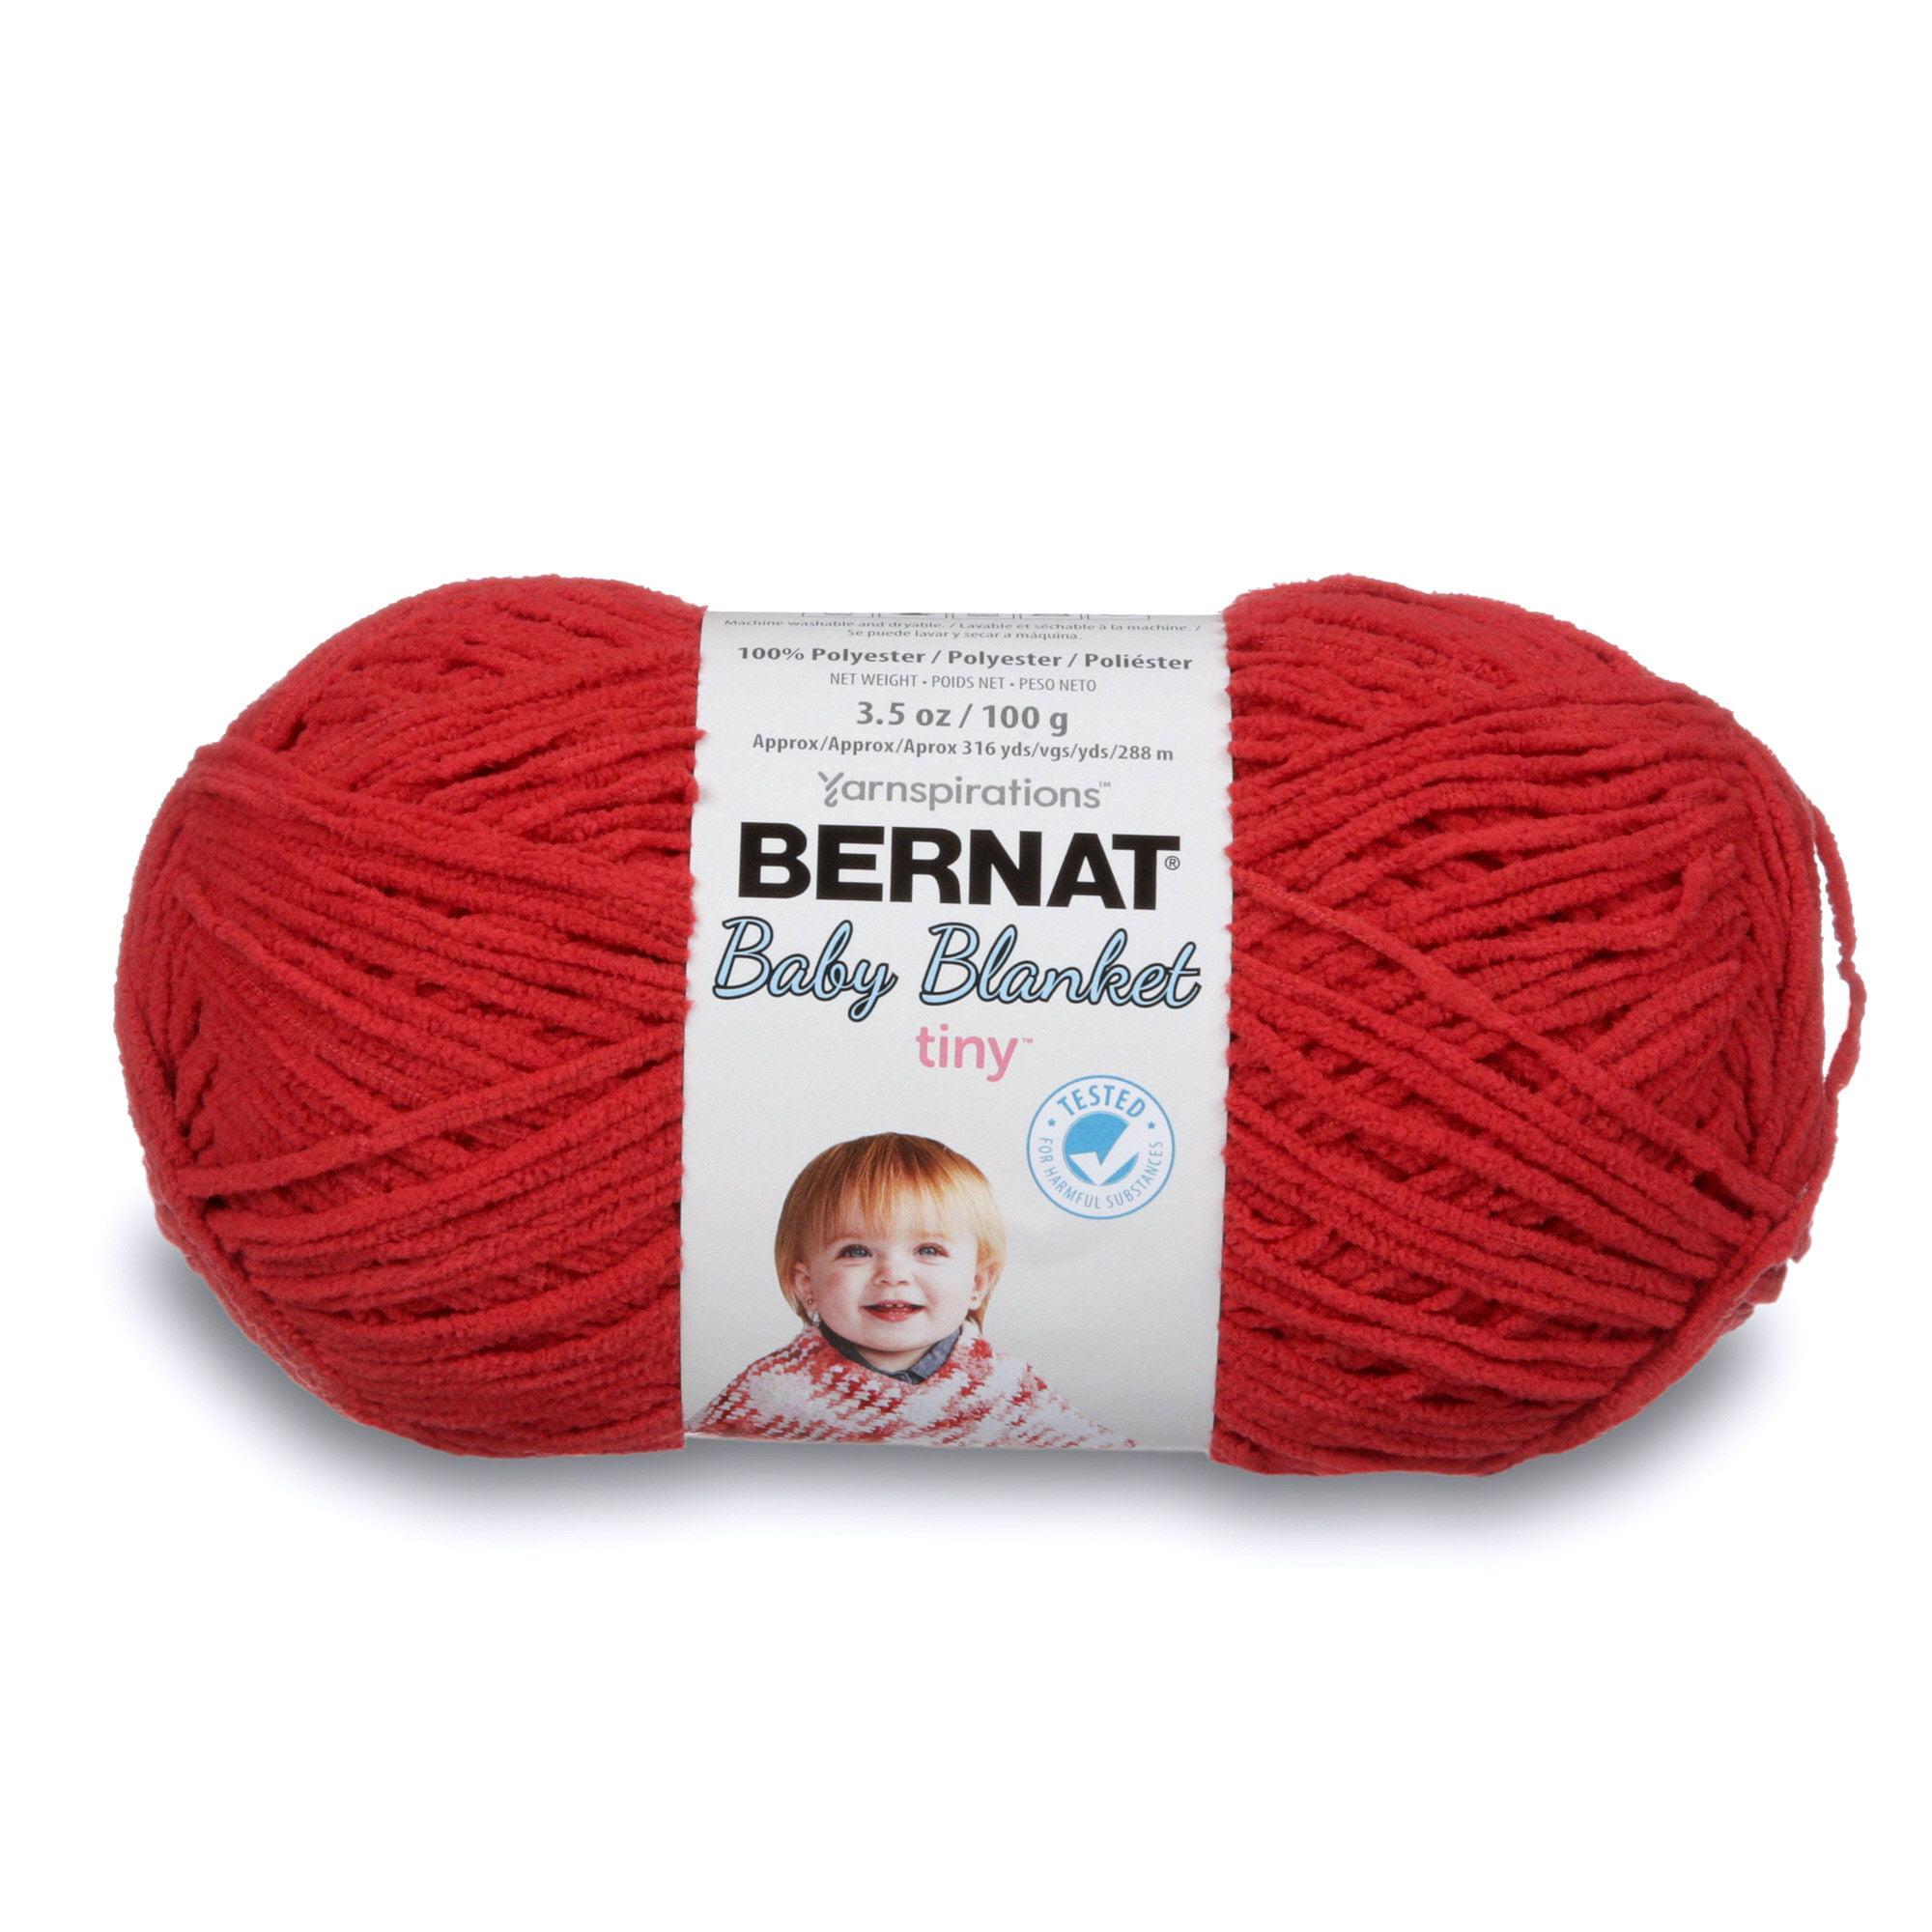 Bernat Baby Blanket Tiny Yarn-Red Barn